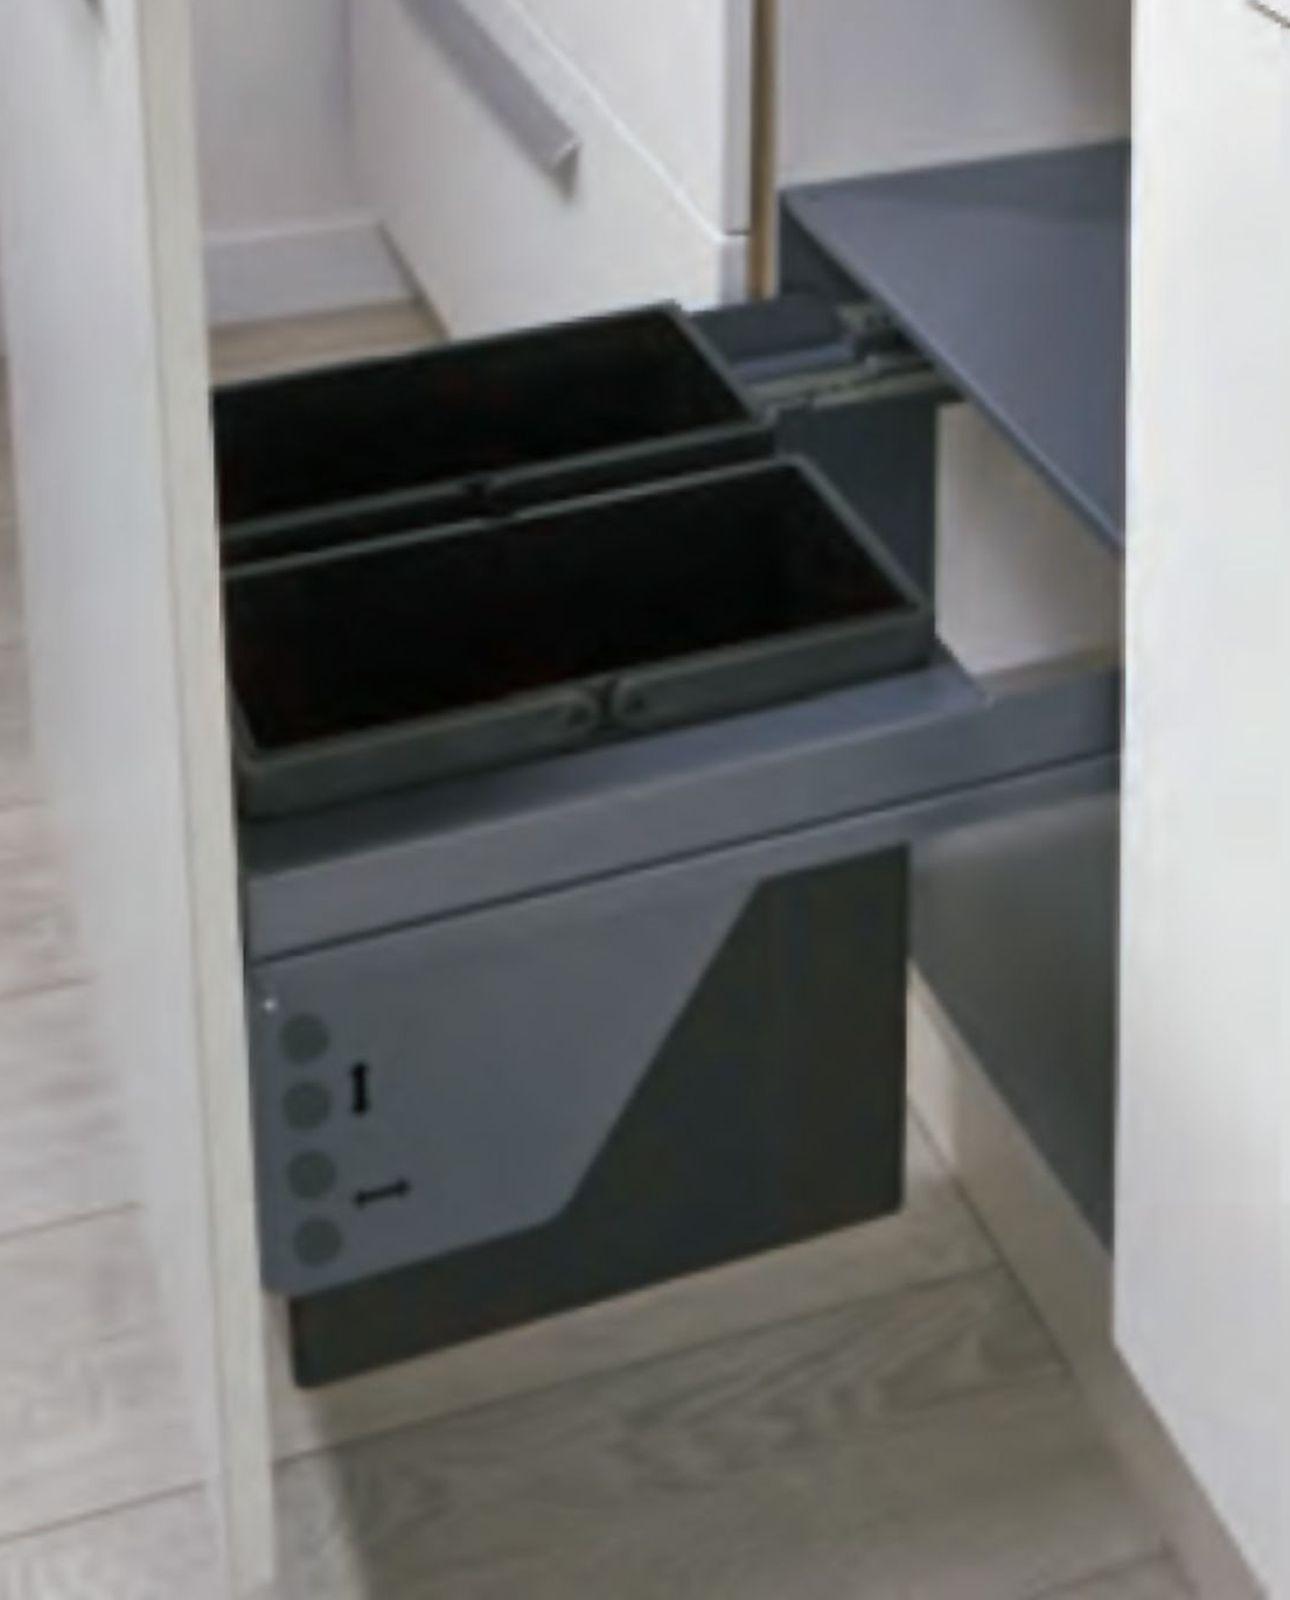 kche mlleimer gallery of cheap mlleimer kche einbau. Black Bedroom Furniture Sets. Home Design Ideas